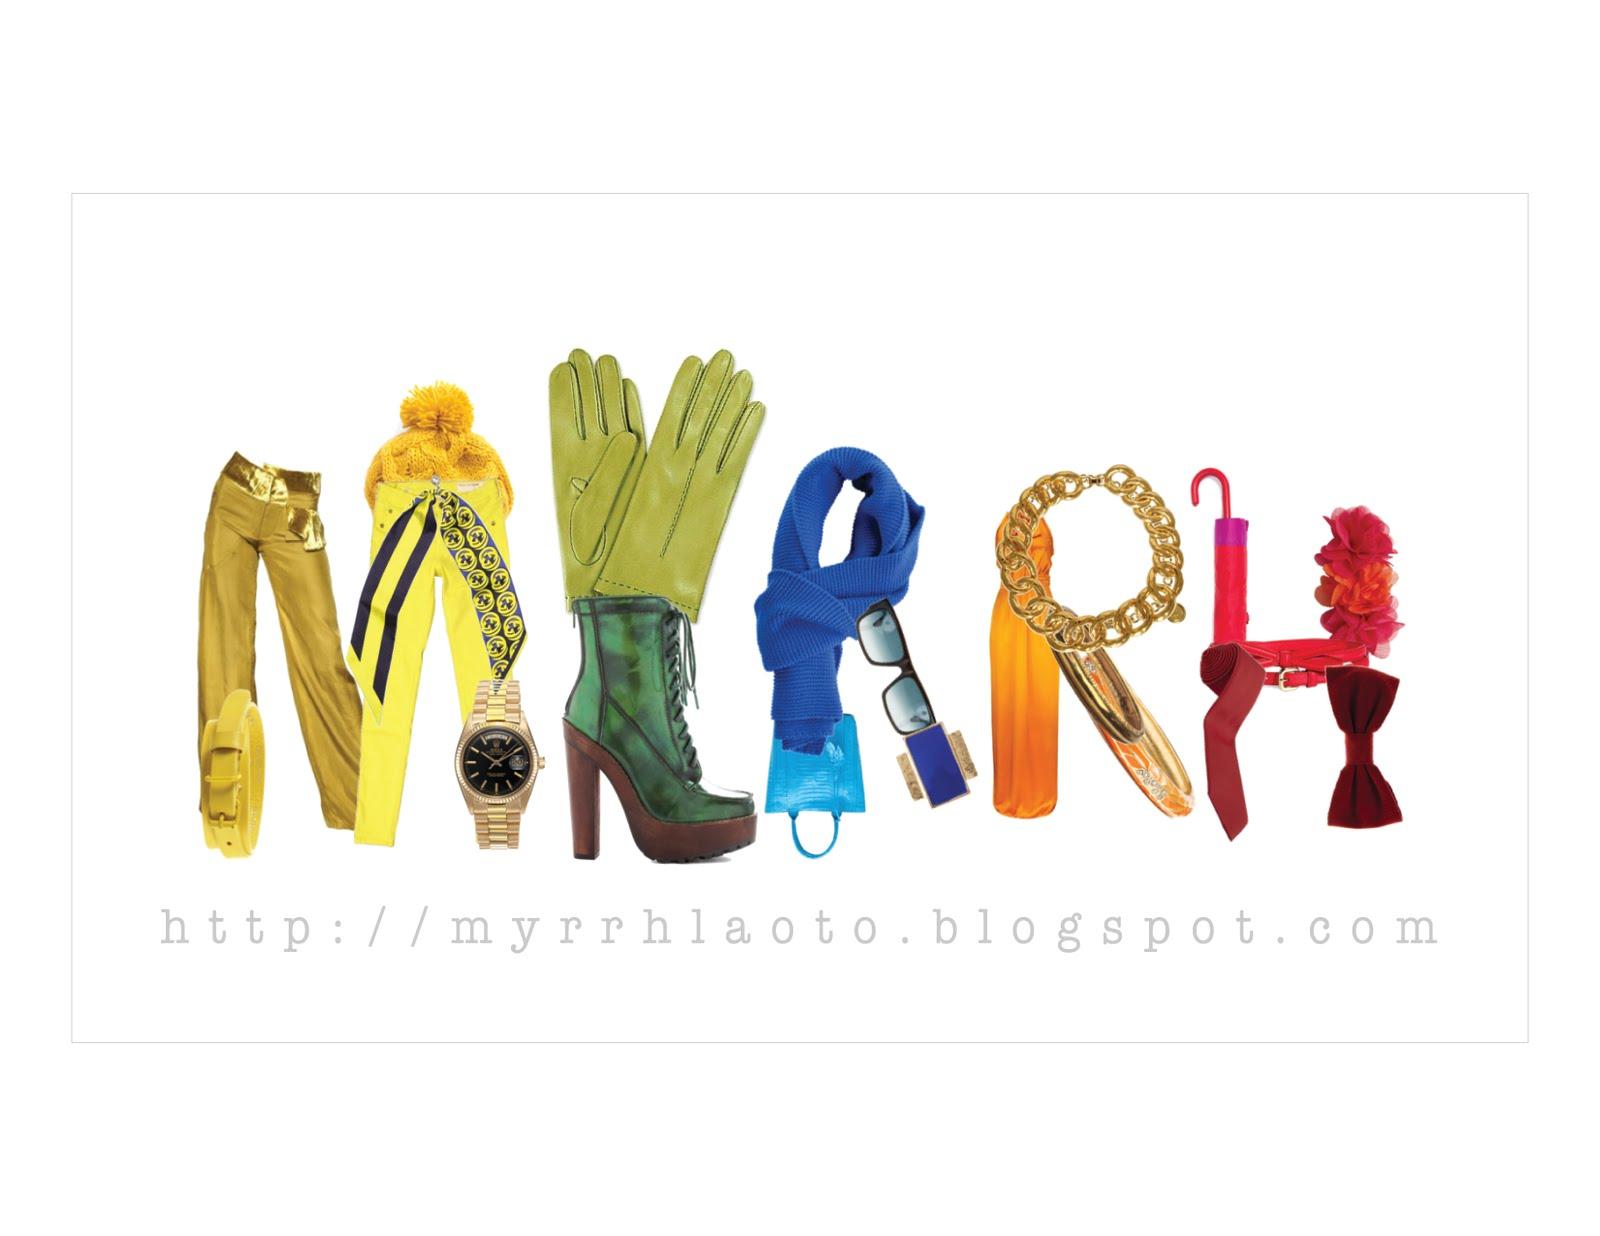 MYRRH LAO TO